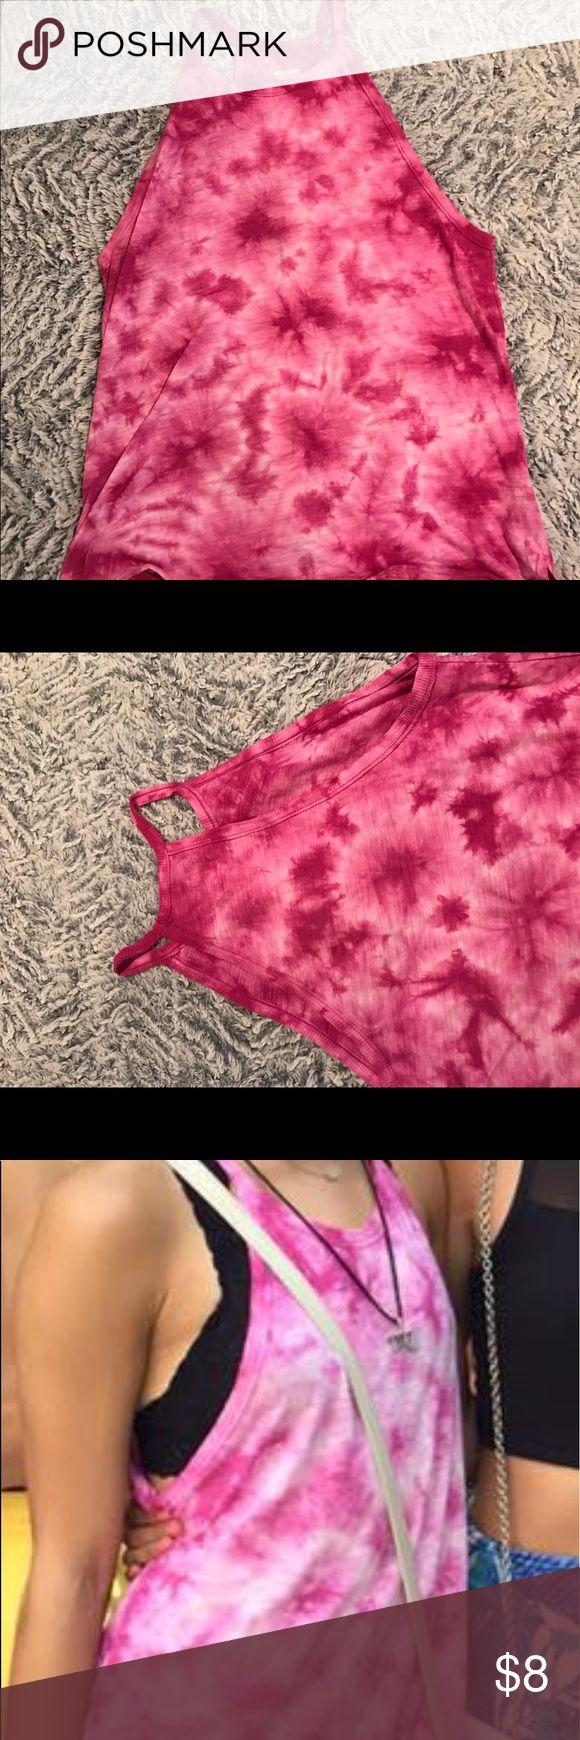 Pink Tie-Dye Razorback Tank size medium tie dye pink razorback tank Mossimo Supply Co. Tops Tank Tops